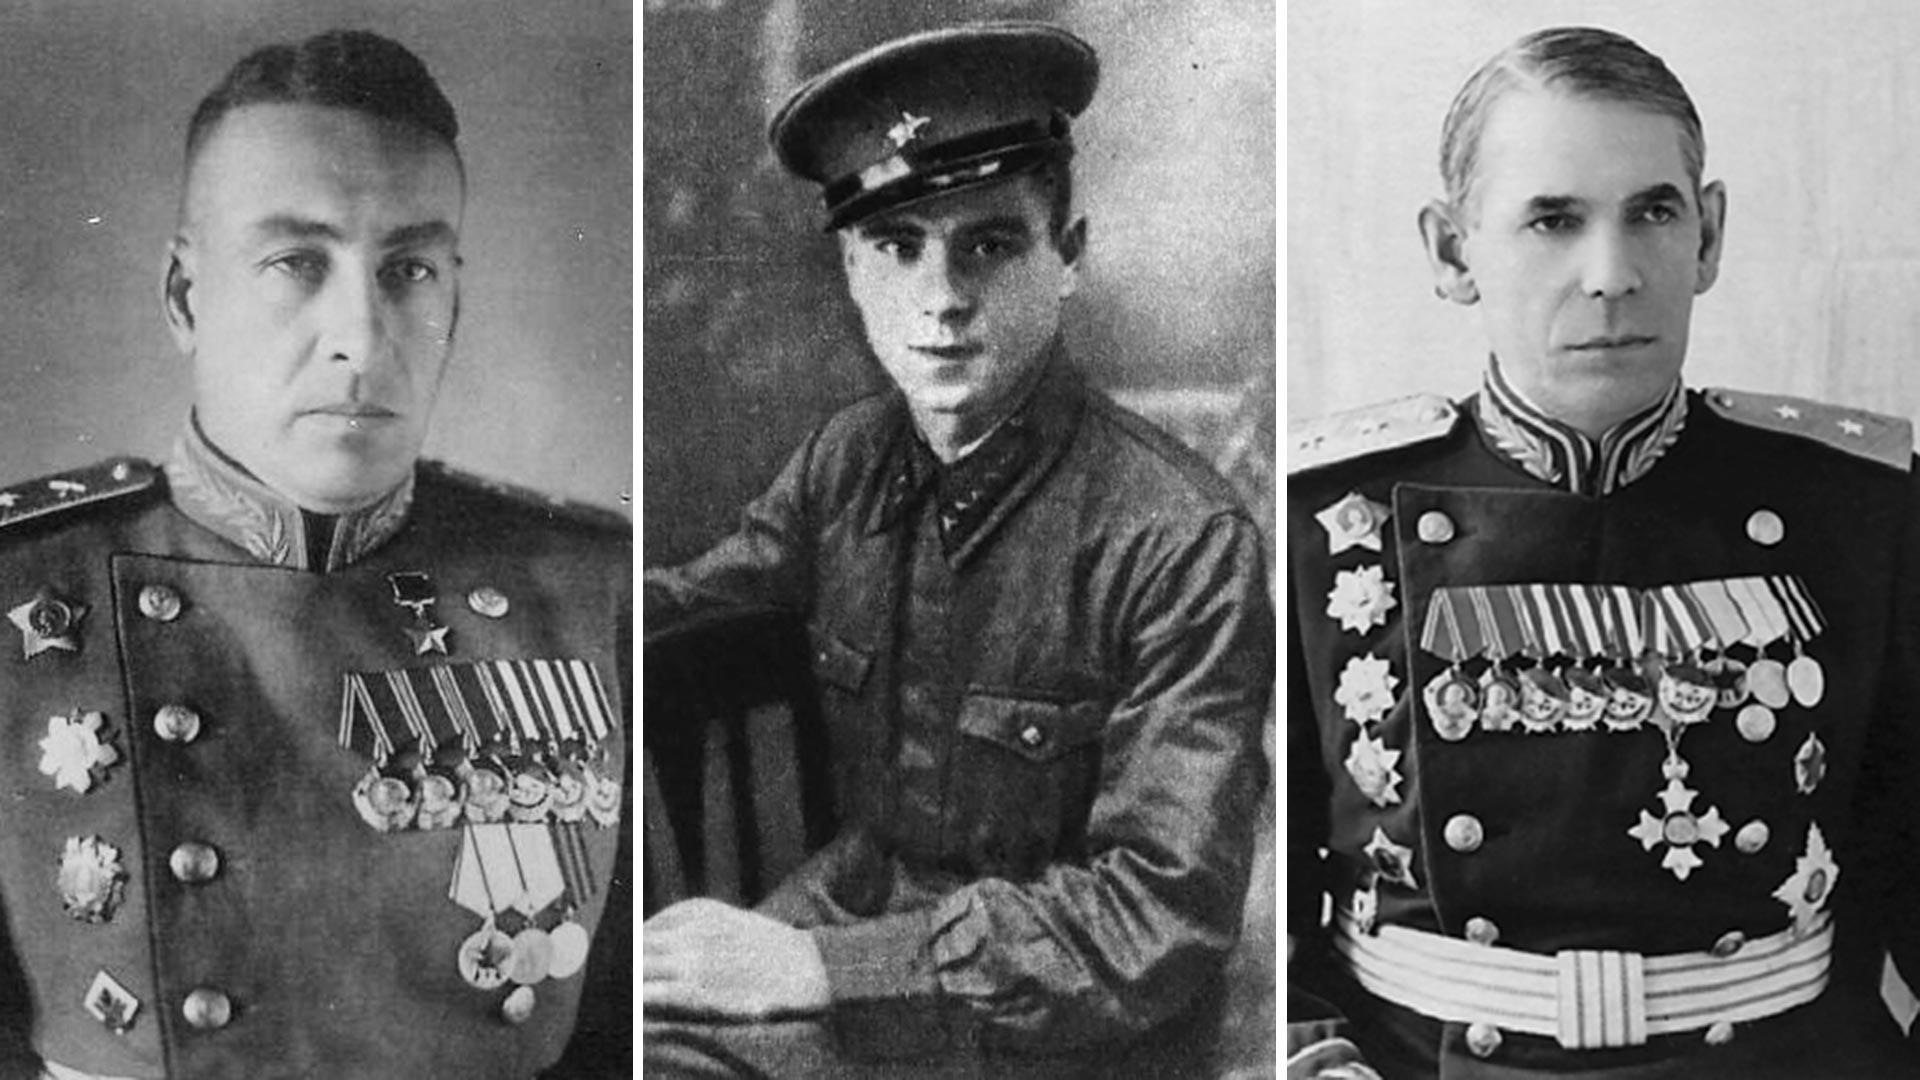 Сергеј Сергејевич Волкенштајн; Мејер Вјачеслав Едуардович; Николај Александрович Гаген